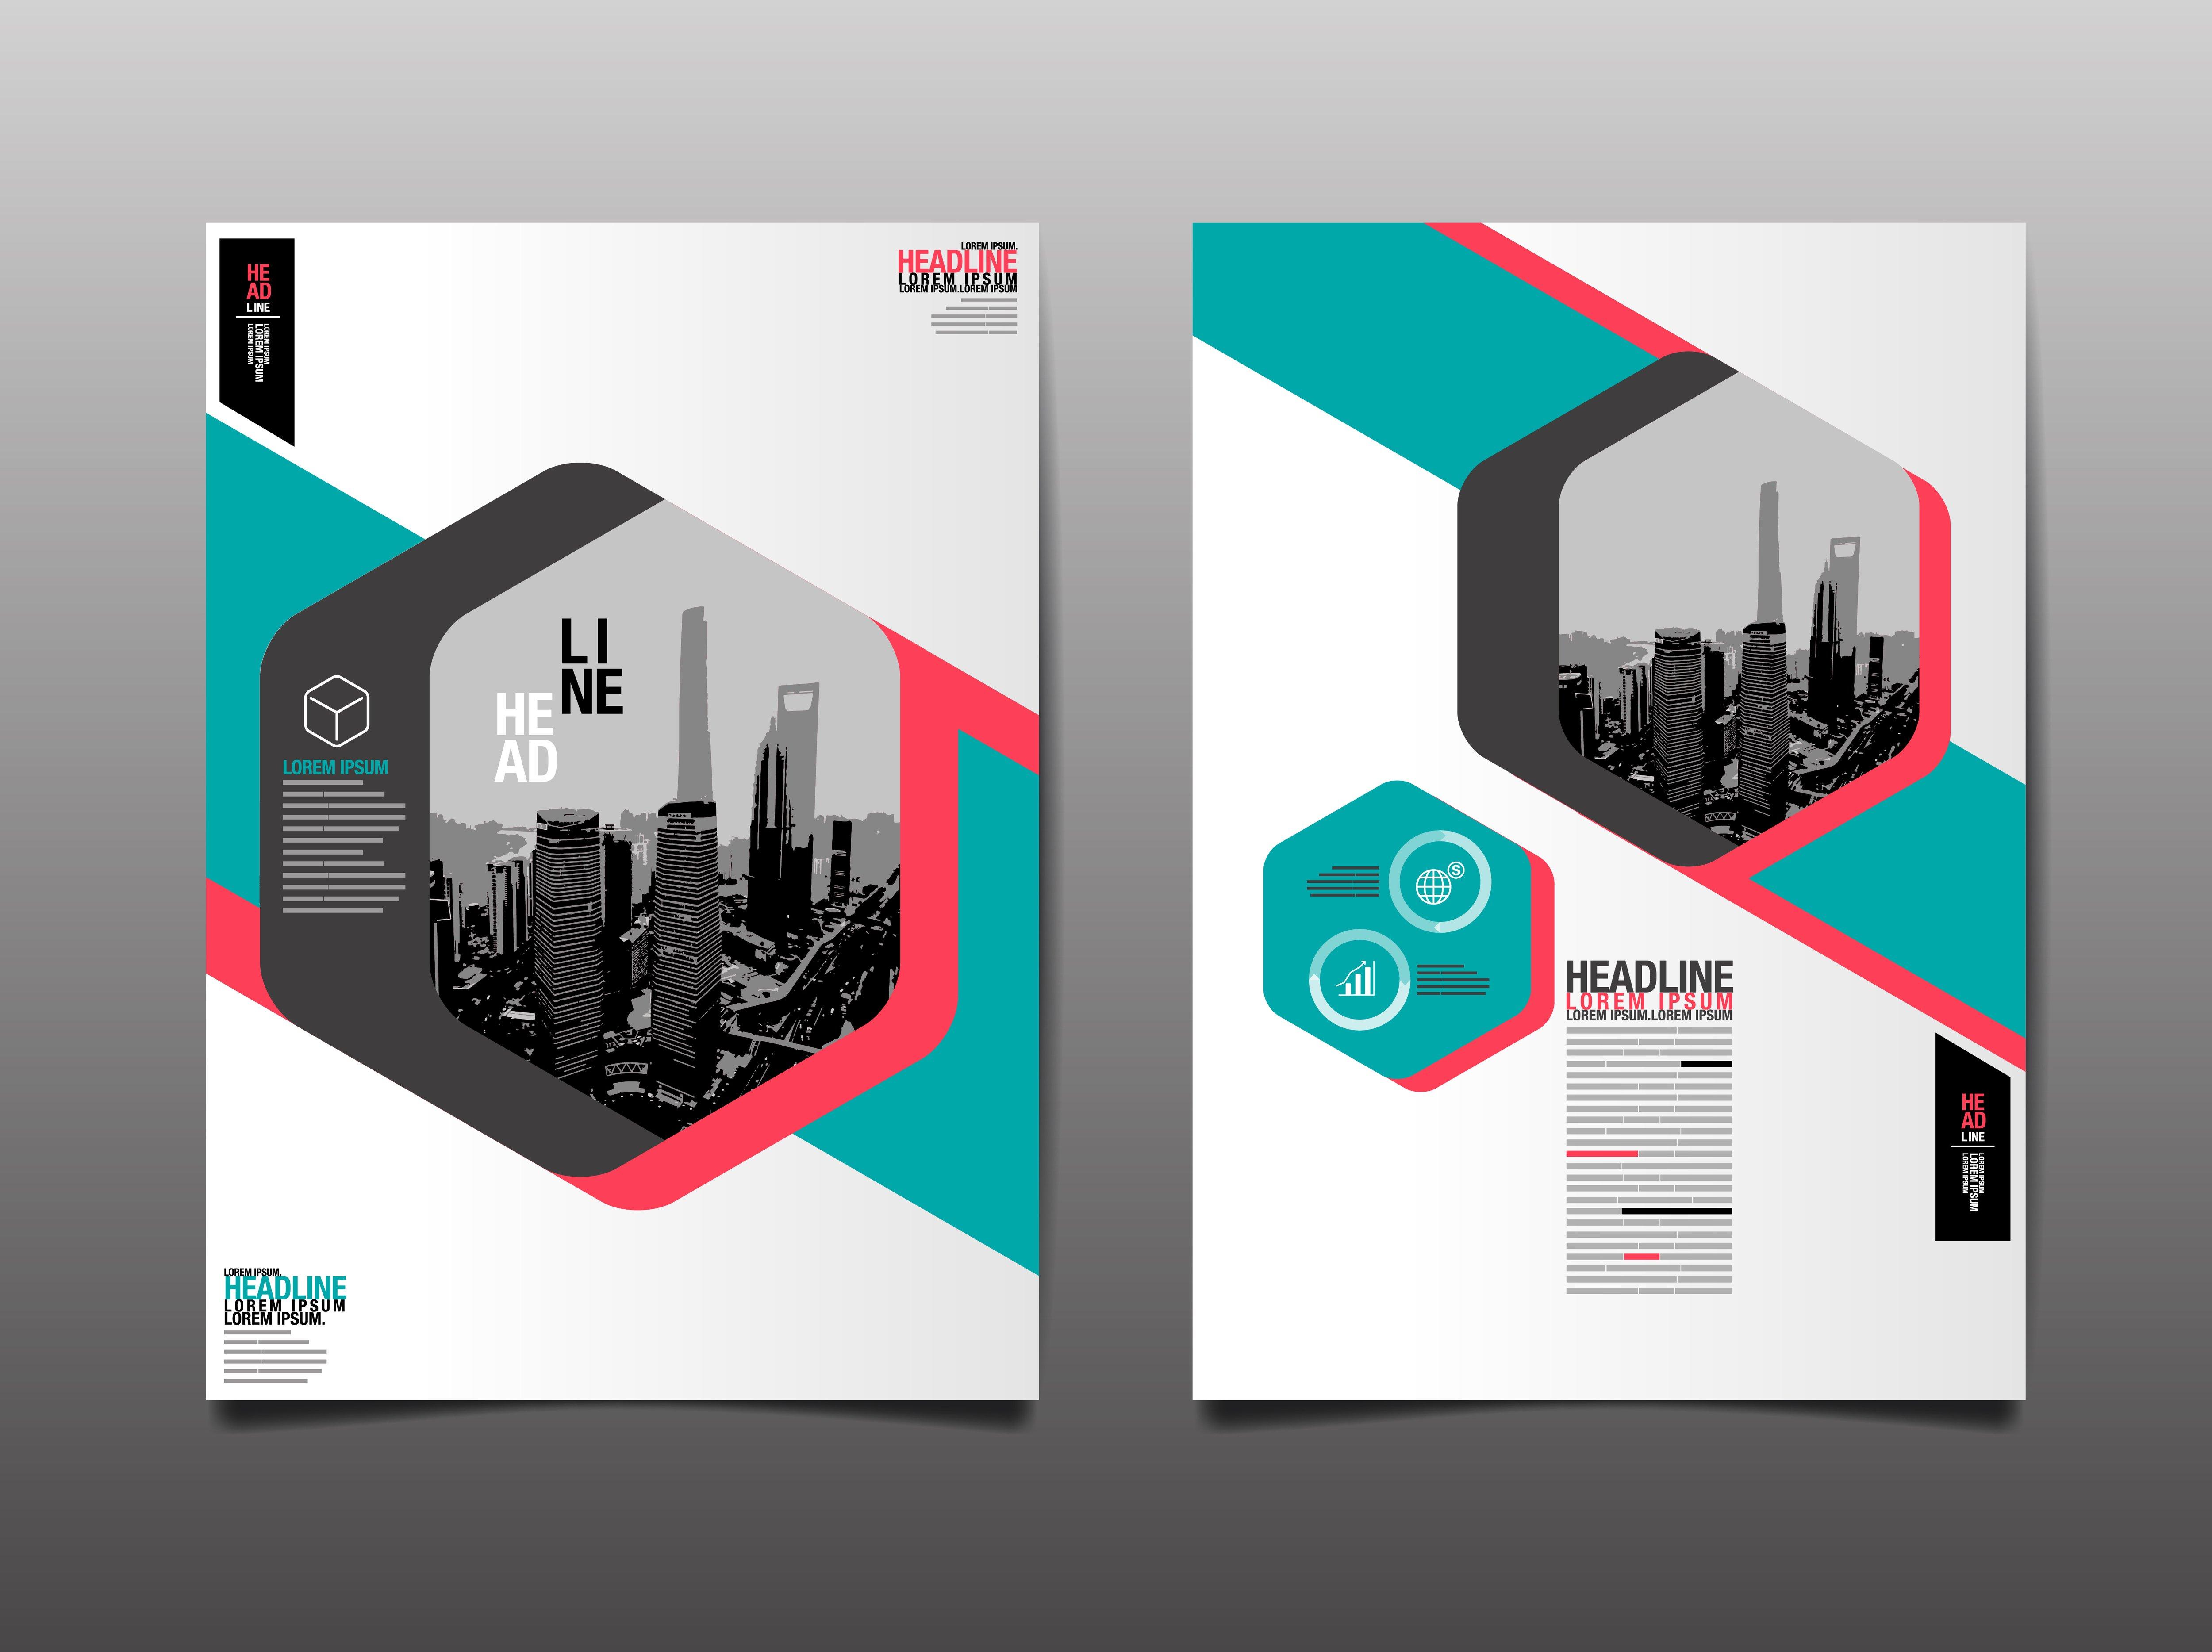 brand-imagery-on-brochure